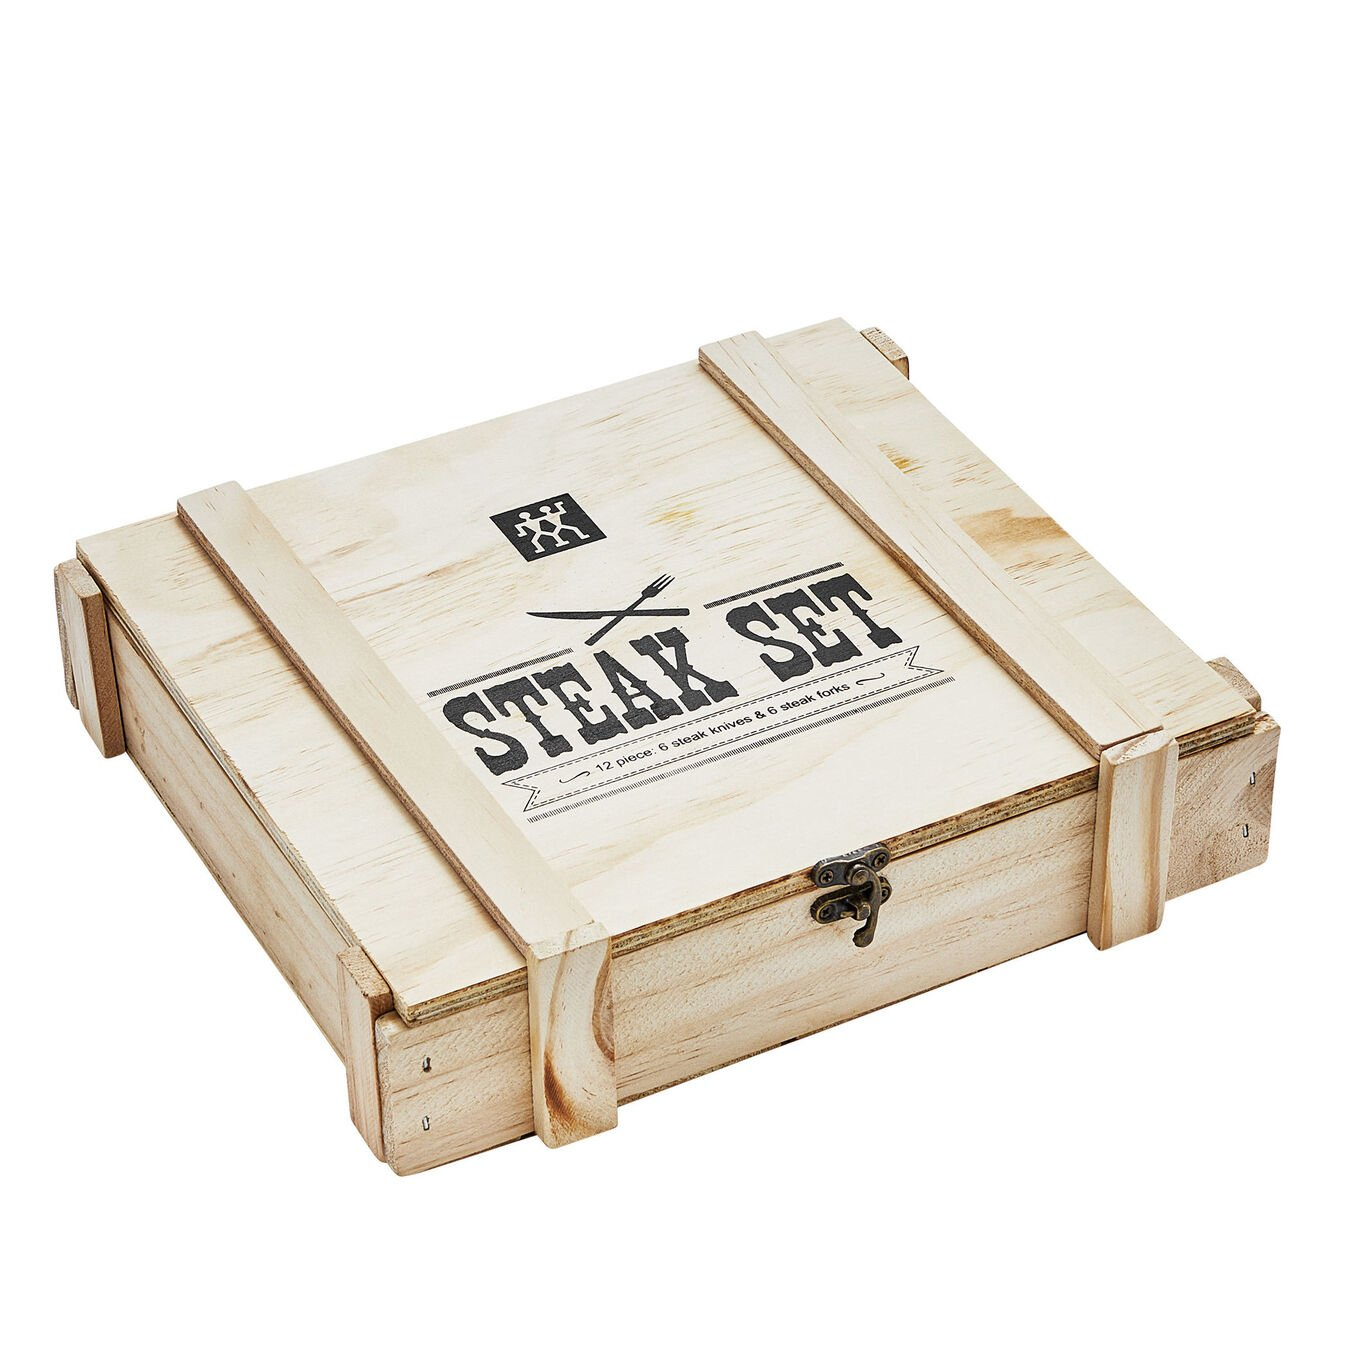 12-pc, Steak Dinner Stainless Steel Steak Knife Set in Wood Presentation Box,,large 2